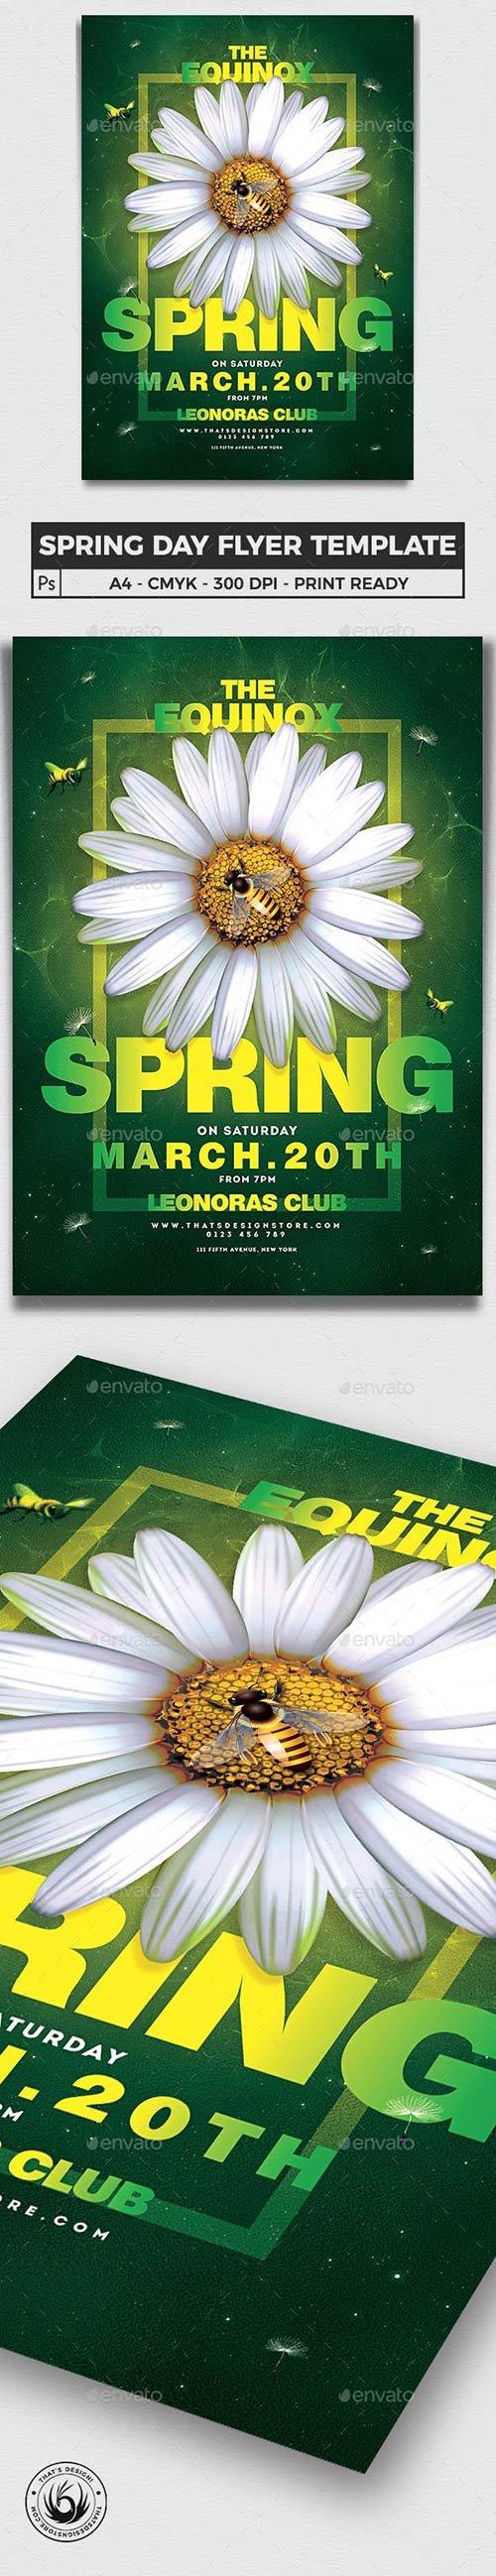 Graphicriver - Spring Day Flyer Template V3 23131740